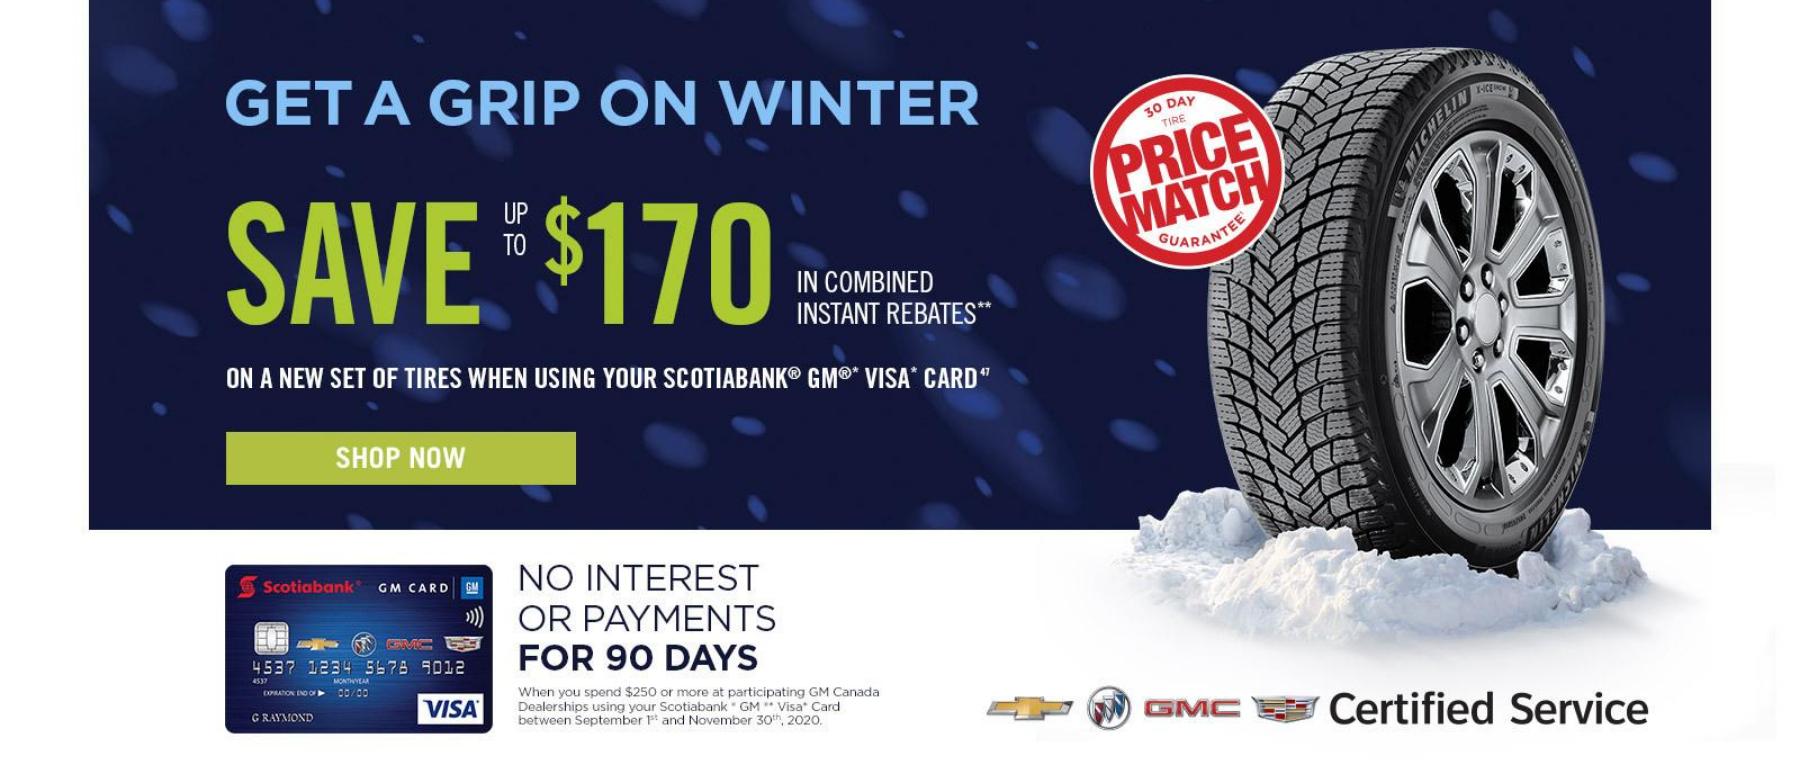 Save $170 Instant Rebates